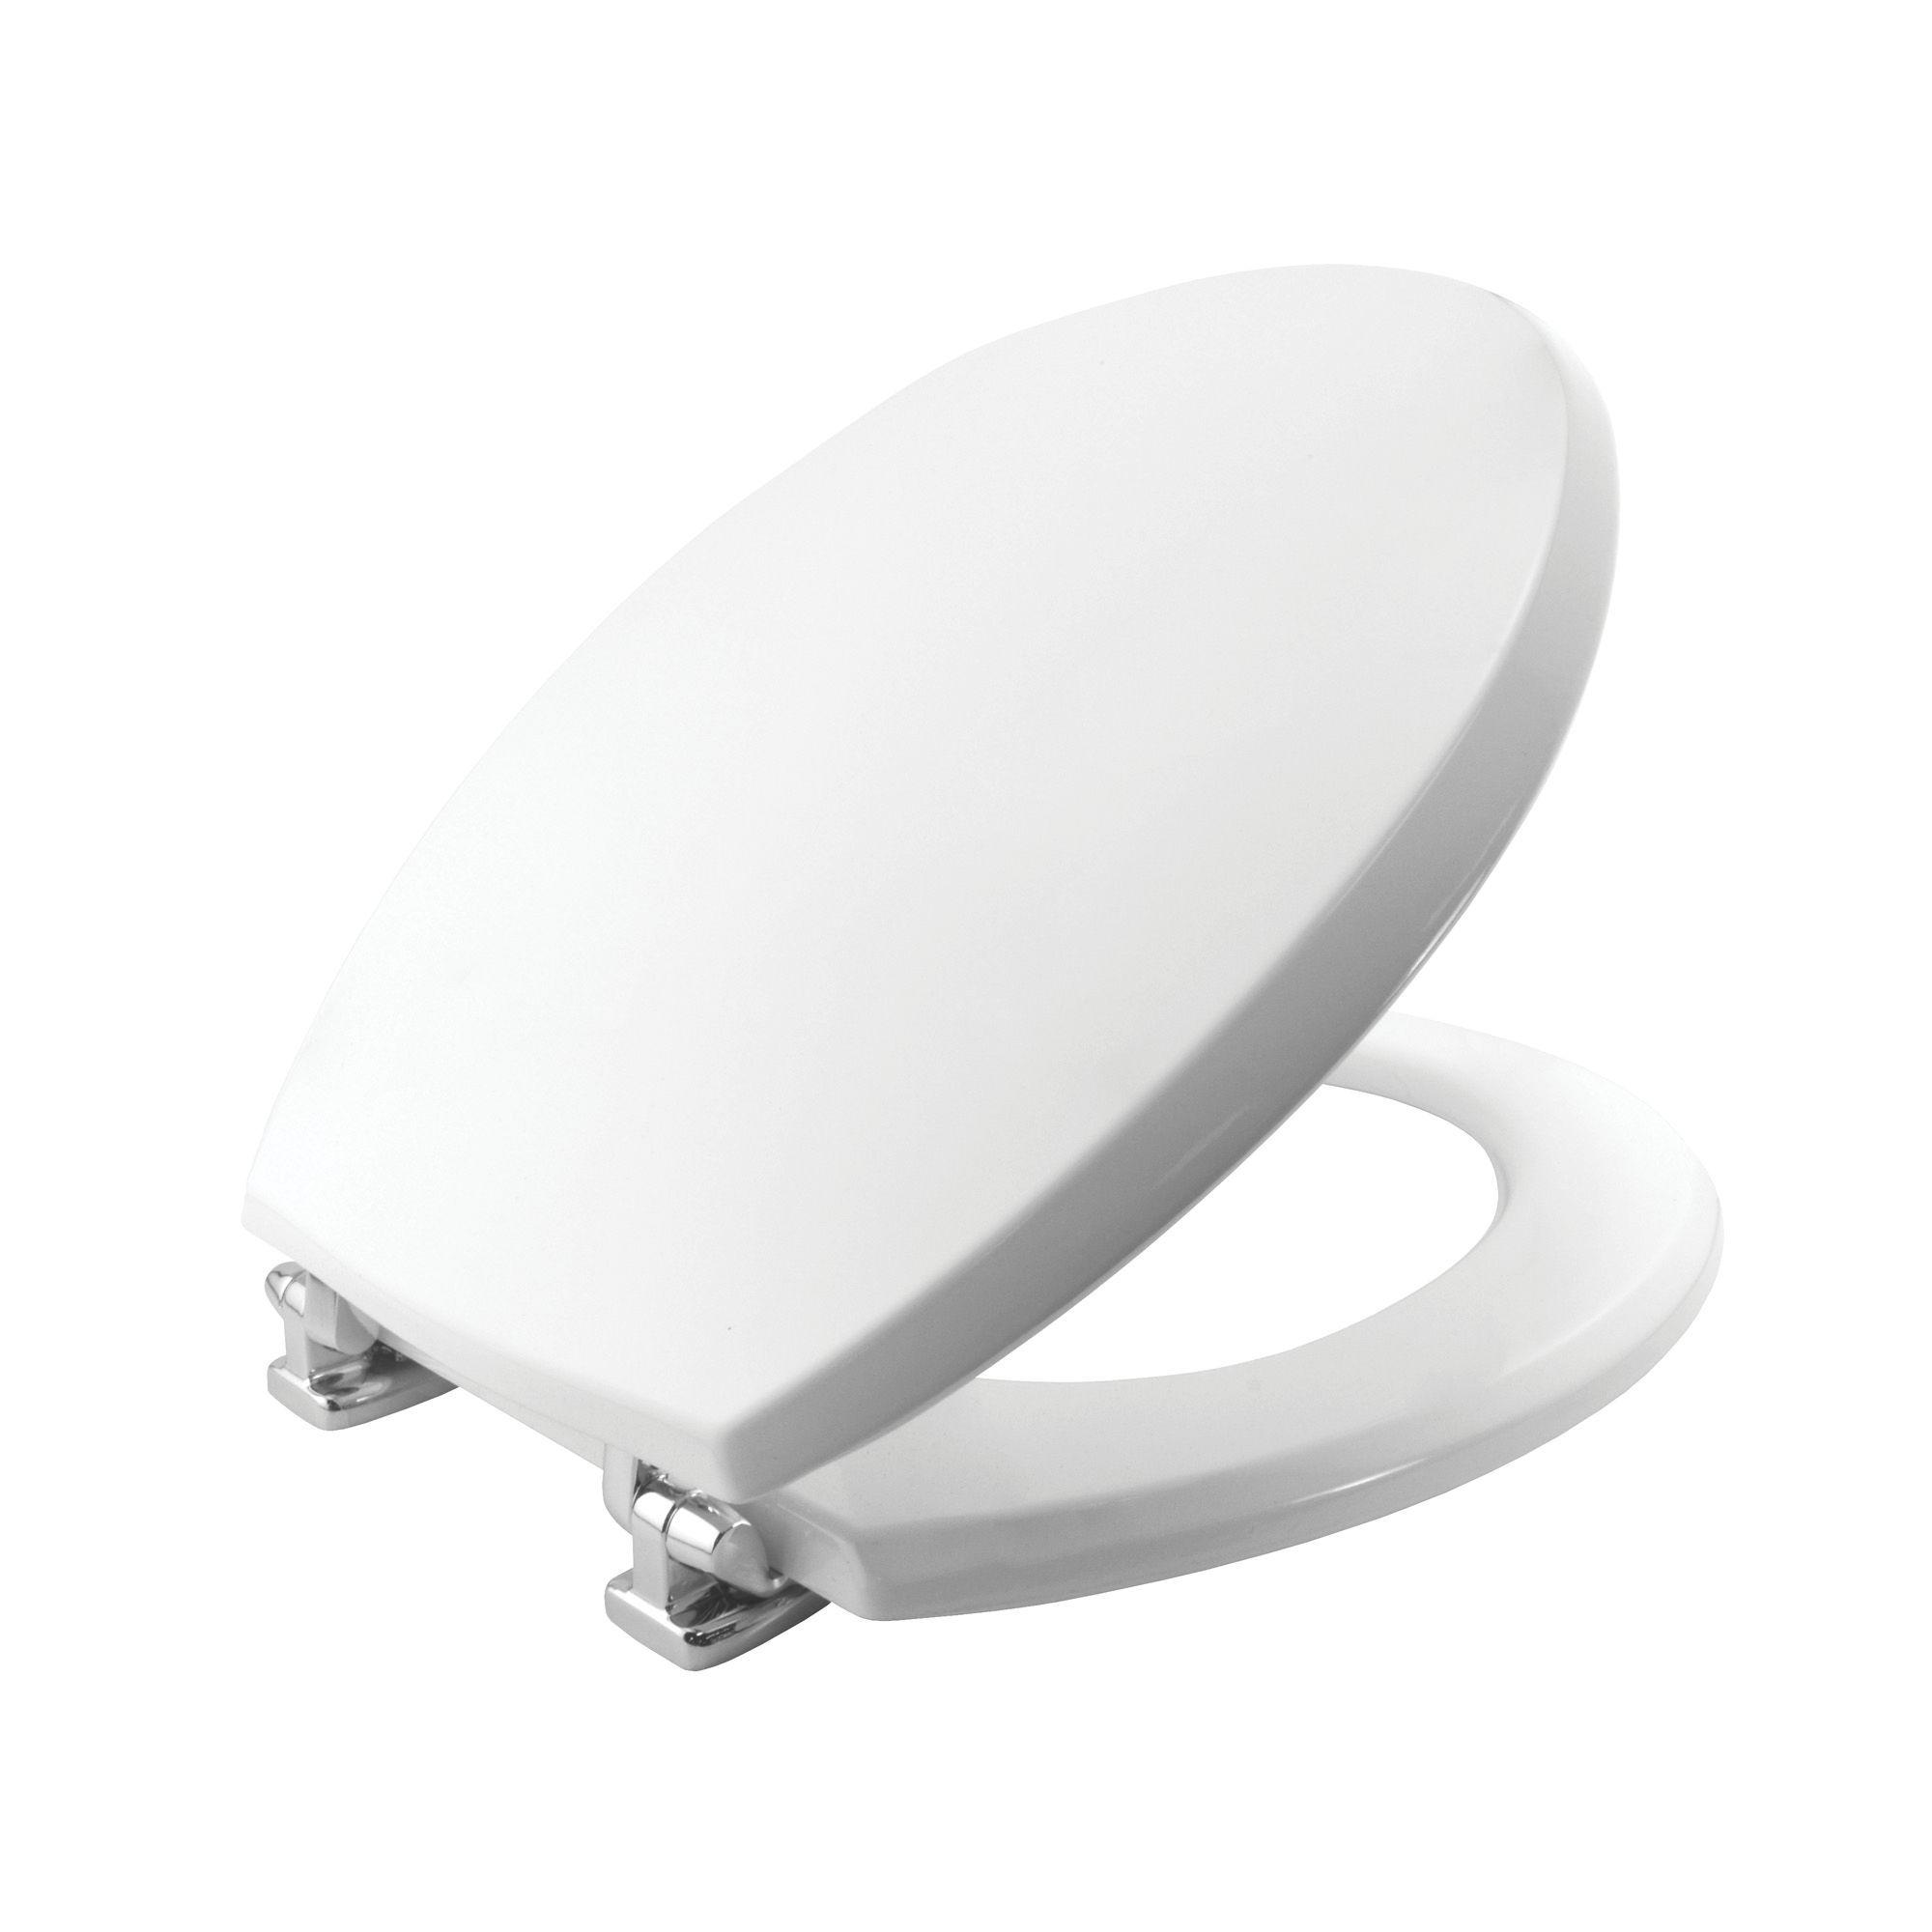 Bemis White Toilet Seat DIY